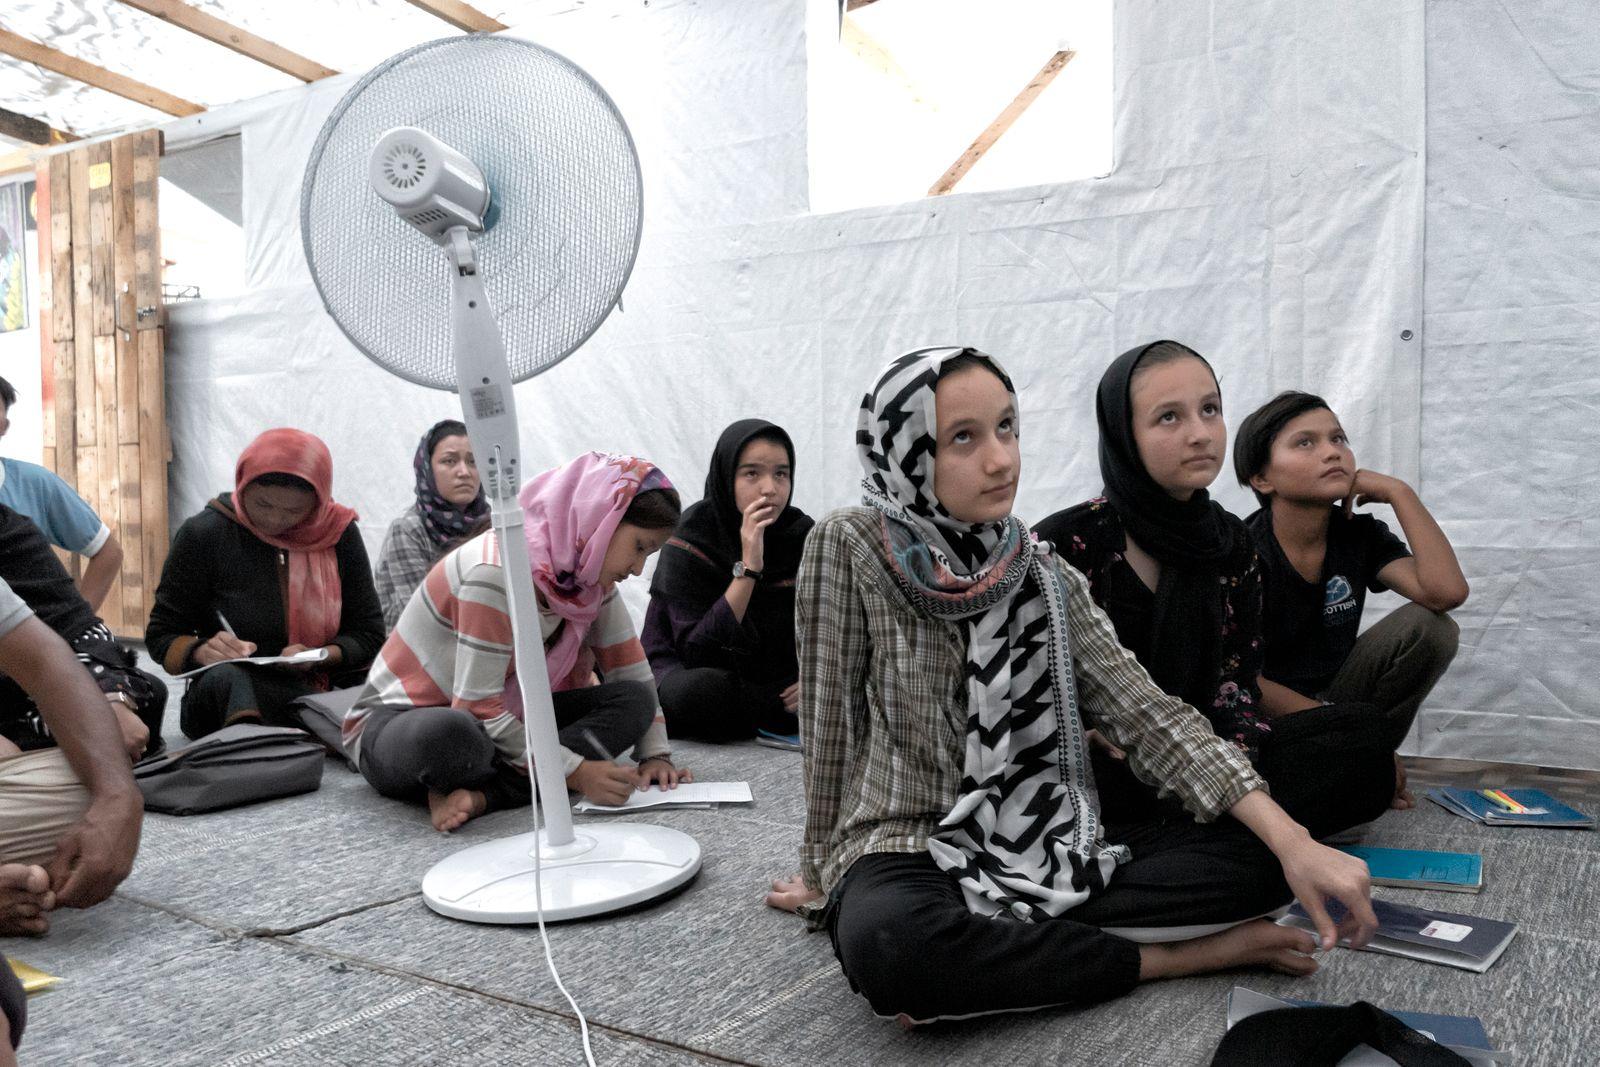 Sex anbieten flüchtlingen Flüchtlingen Sex